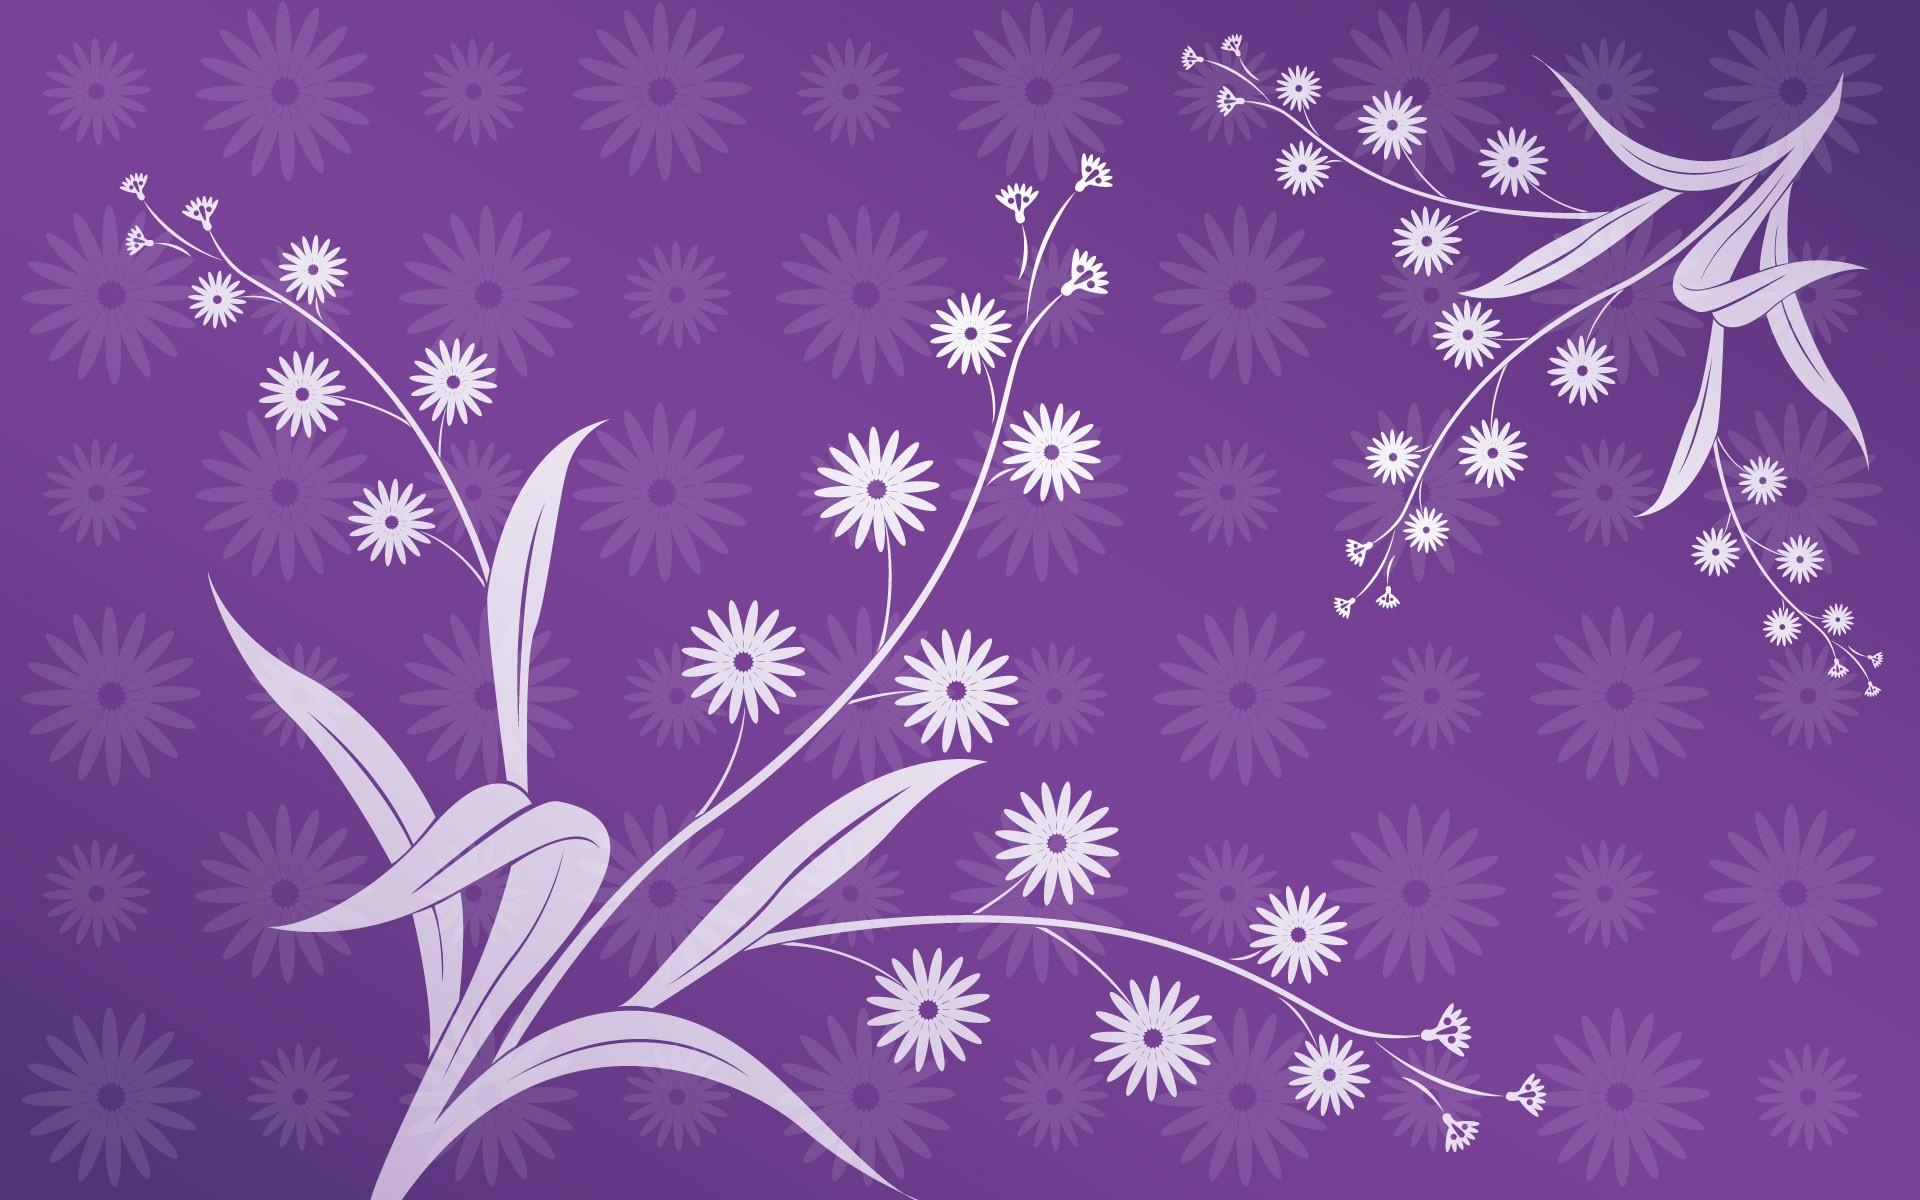 Purple Patterns Wallpaper 1920x1200 Purple Patterns Floral 1920x1200